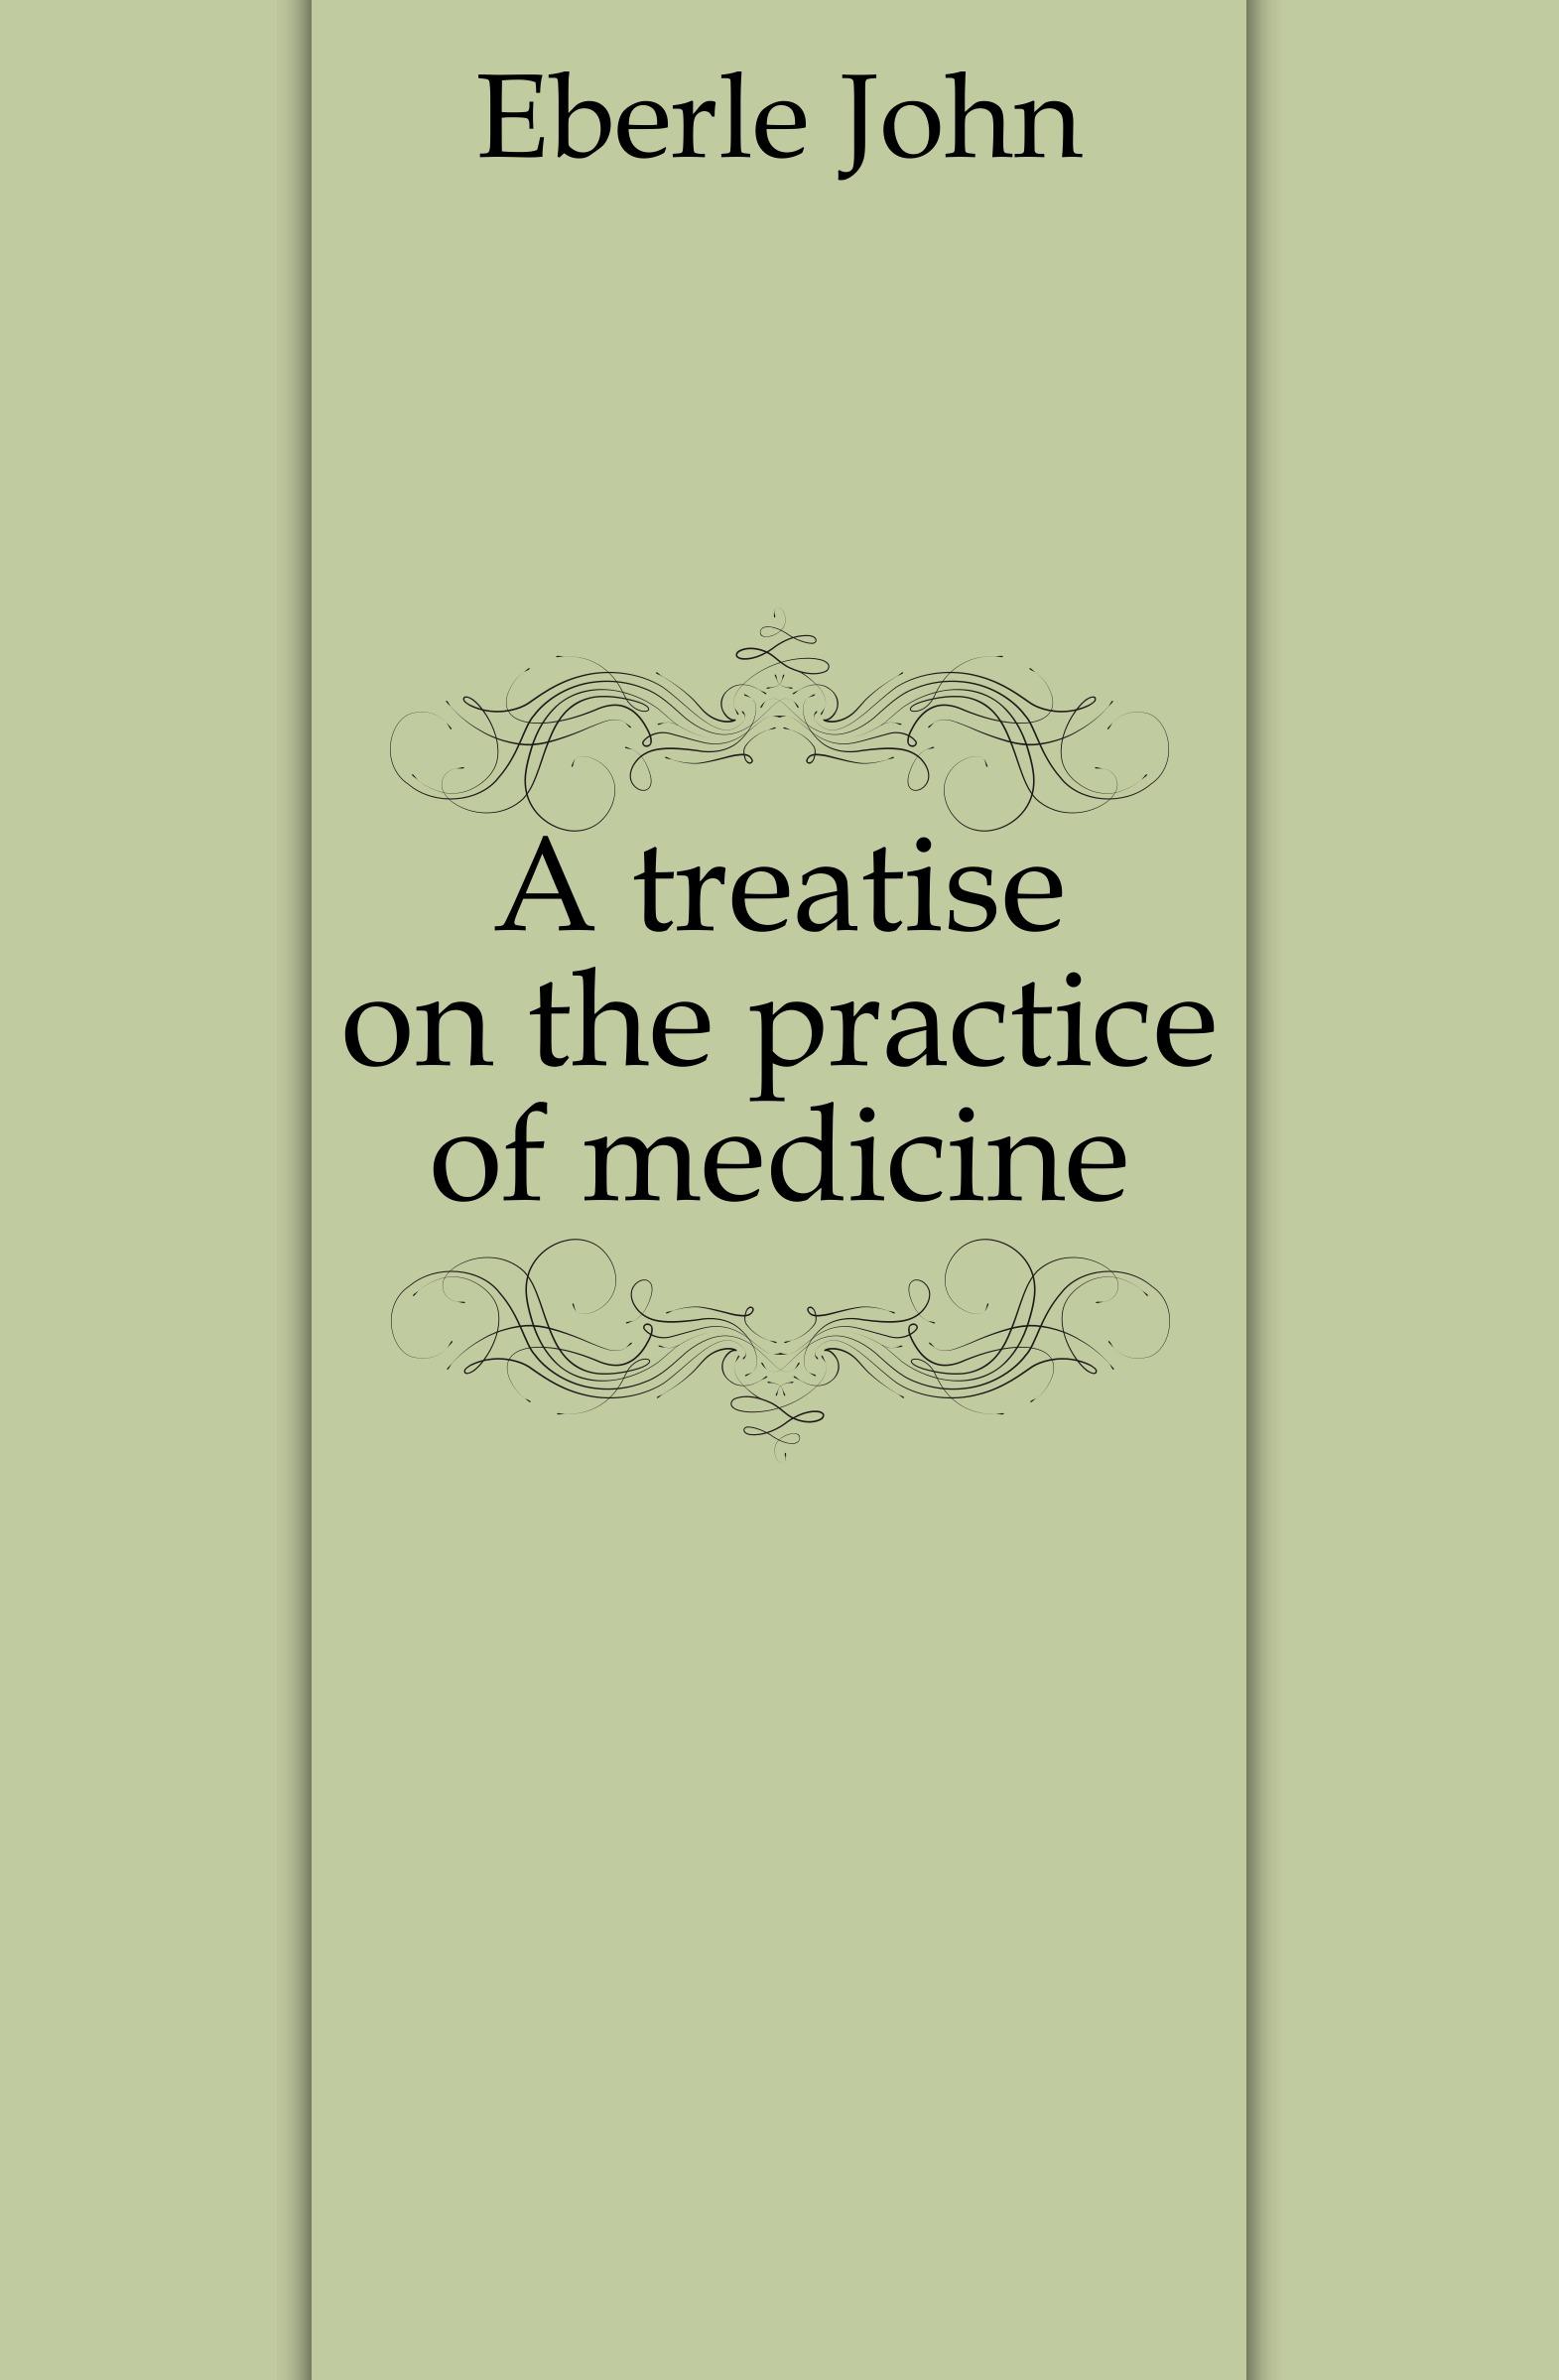 Eberle John A treatise on the practice of medicine edwin r maxson a treatise on the practice of medicine